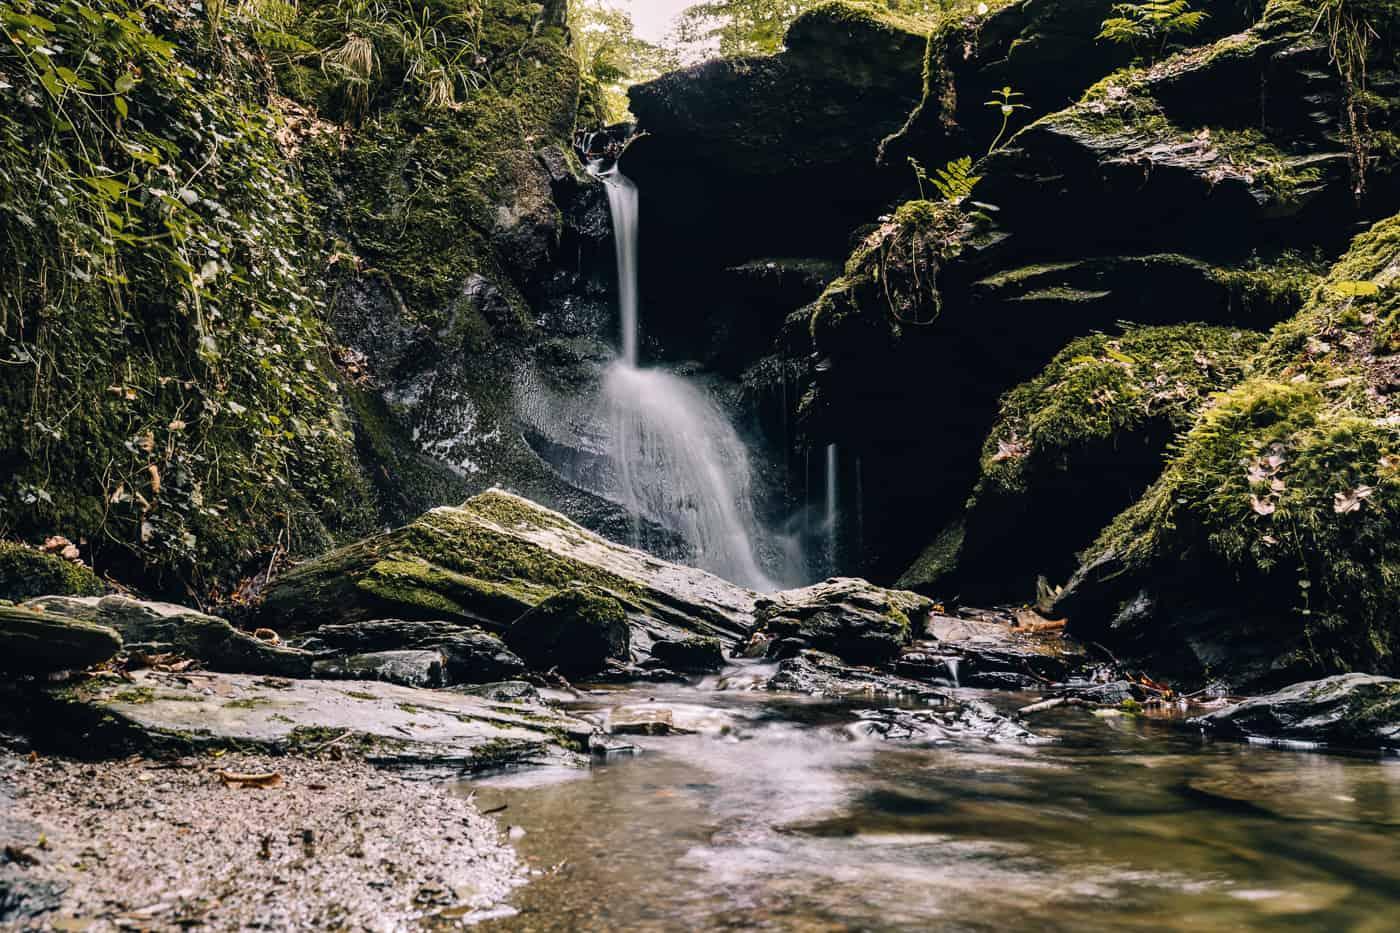 Baybachklamm Traumschleife Wanderung - Wasserfall am Frankenweiler Bach